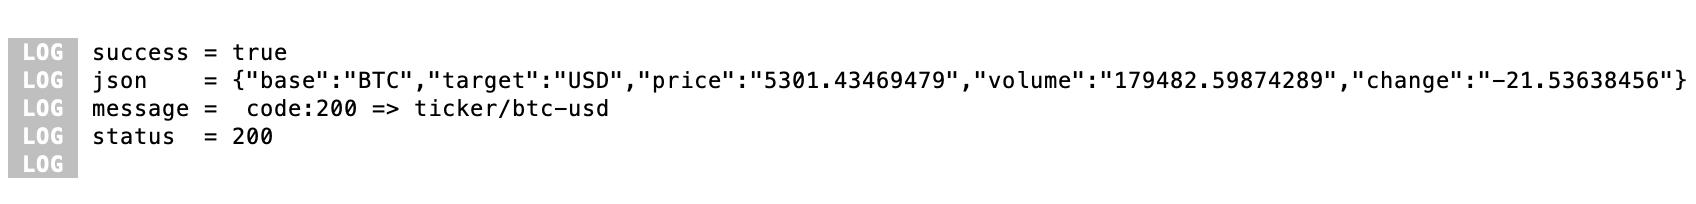 custom_parse_data.png